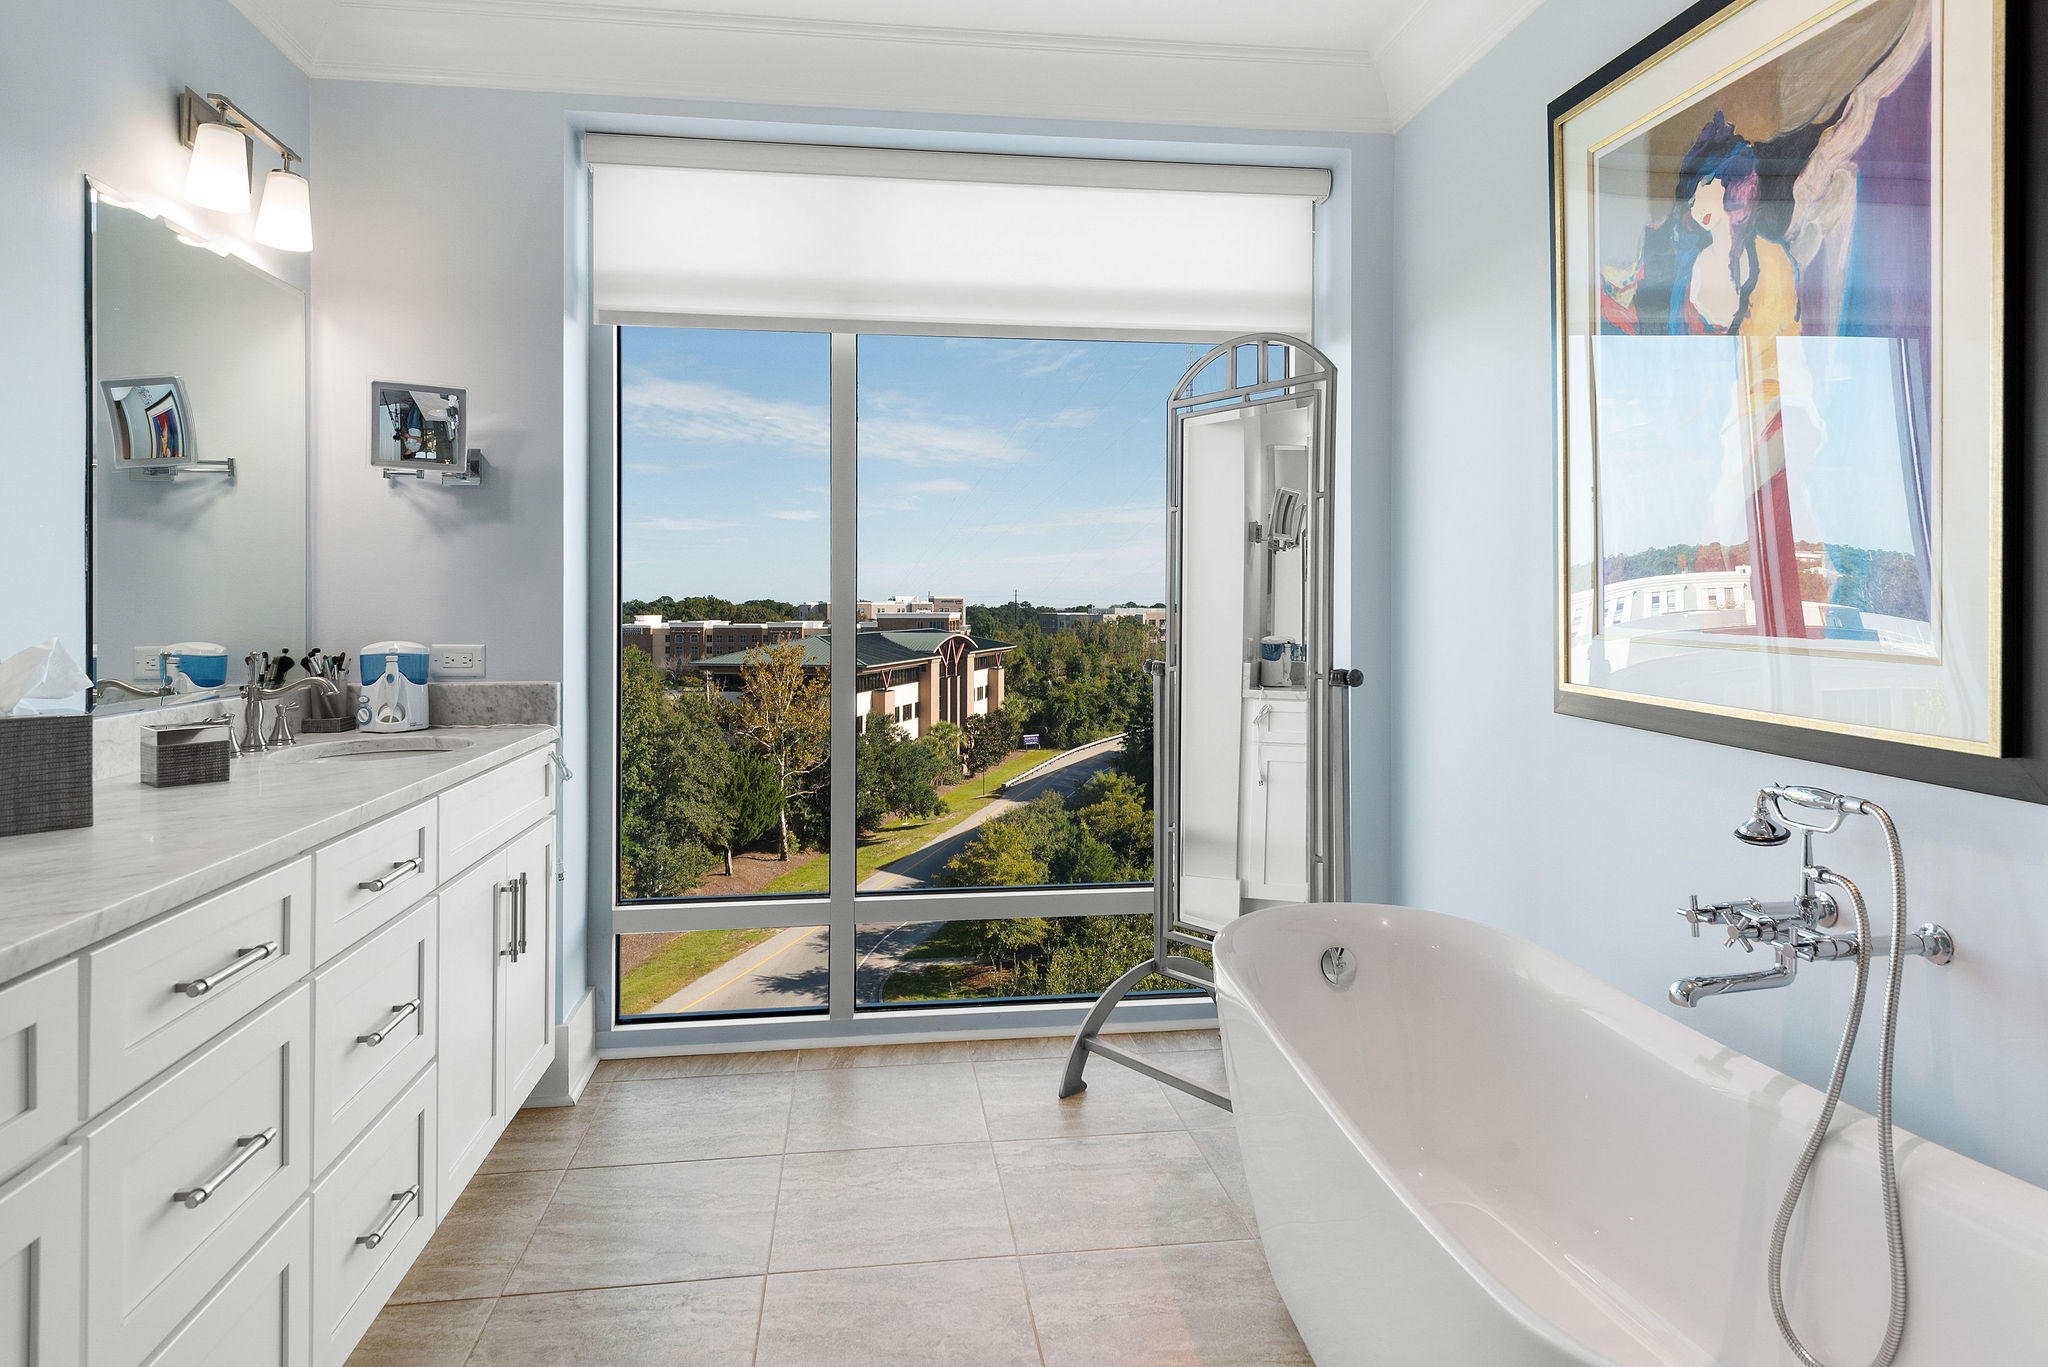 Tides IV Condominiums Homes For Sale - 155 Wingo, Mount Pleasant, SC - 27